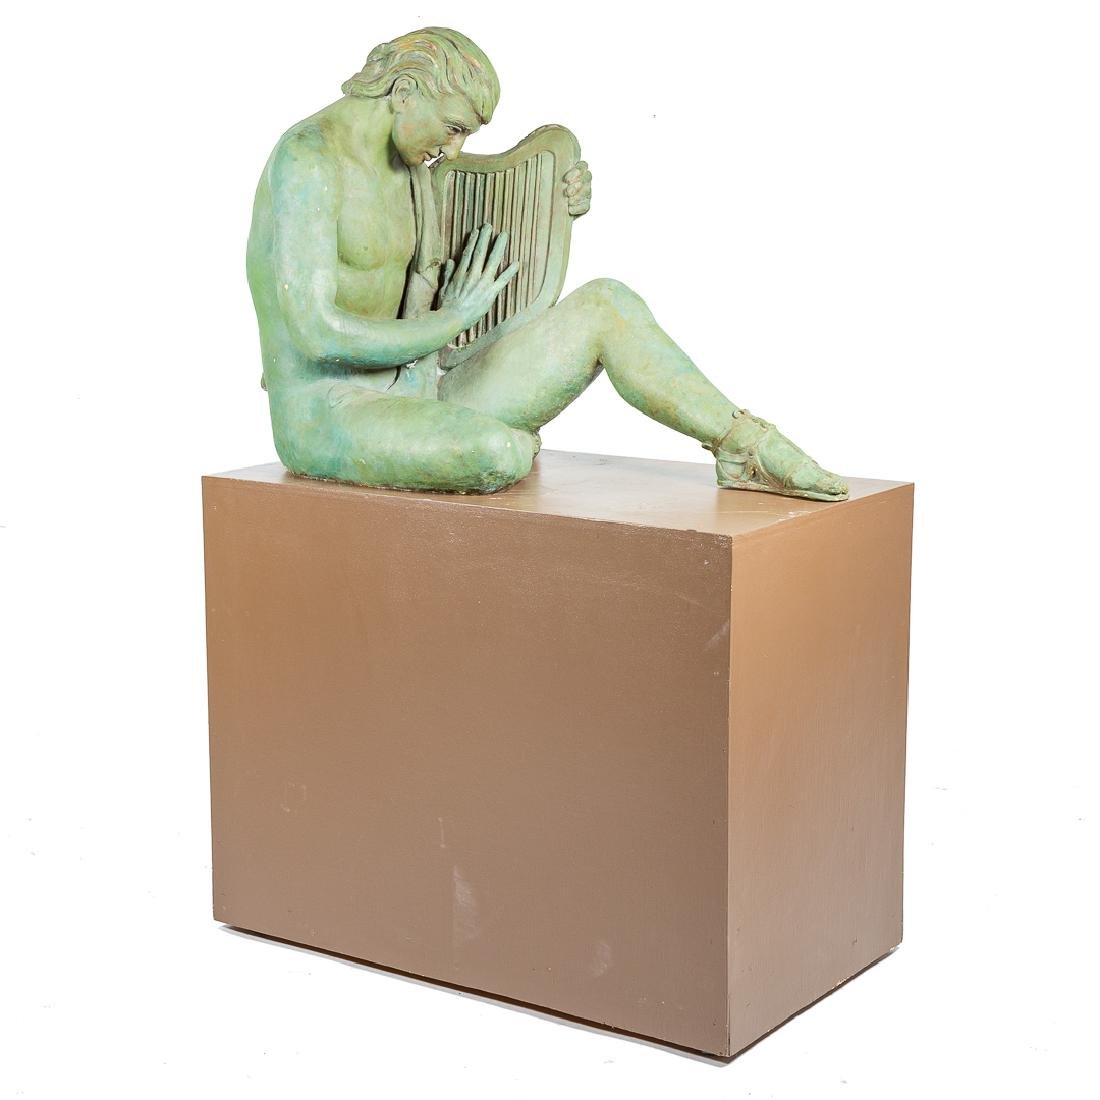 Grace Hill Turnbull, Orpheus plaster figure